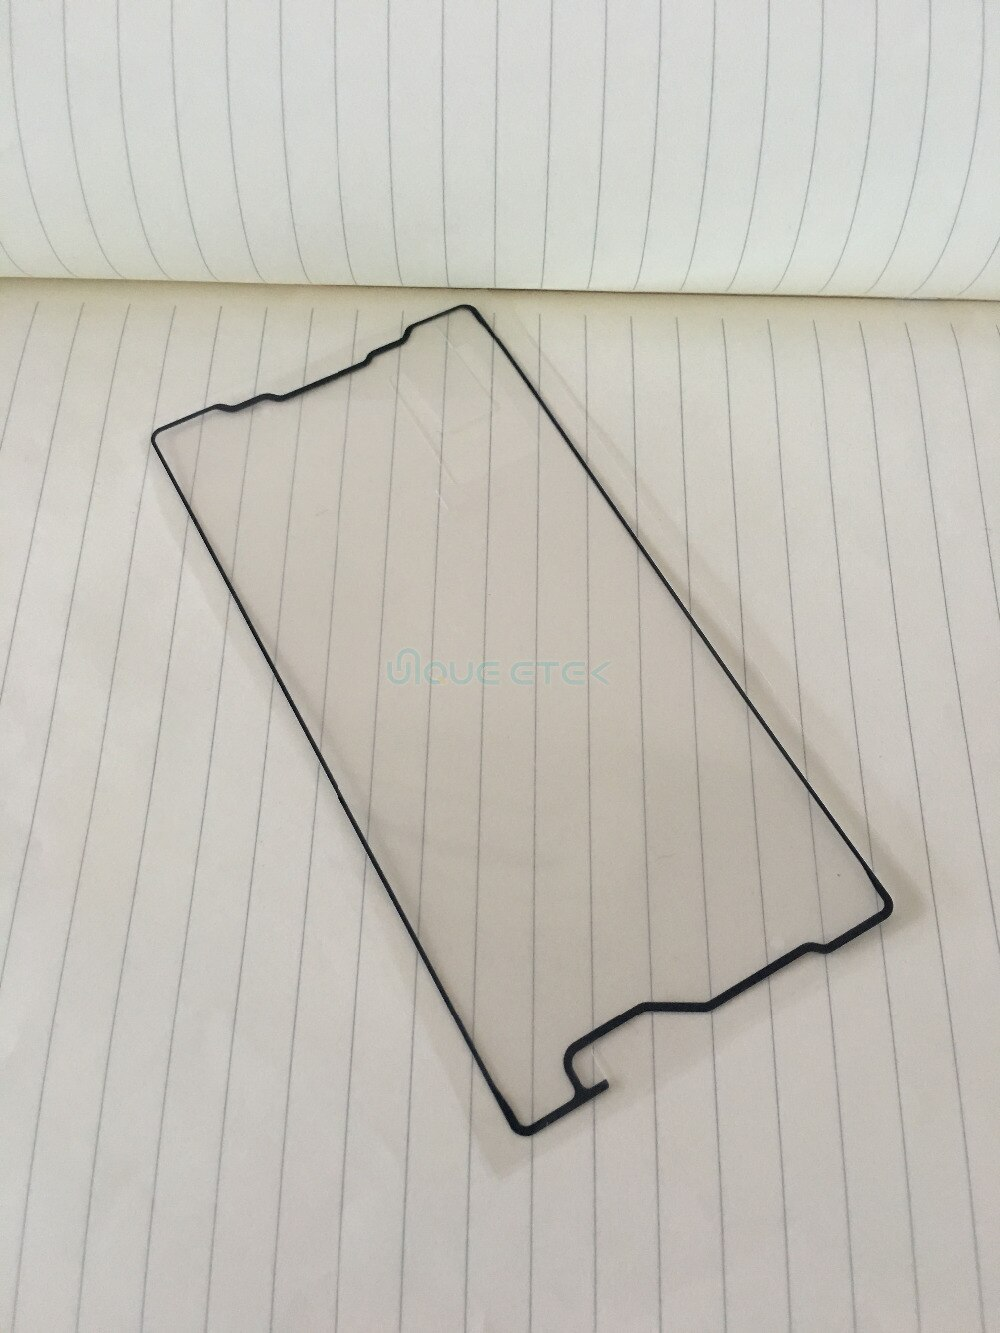 2 unids/lote para Sony Xperia Z5 Compact Mini LCD frontal marco adhesivo; pantalla táctil LCD pegamento para Sony Z5 Mini